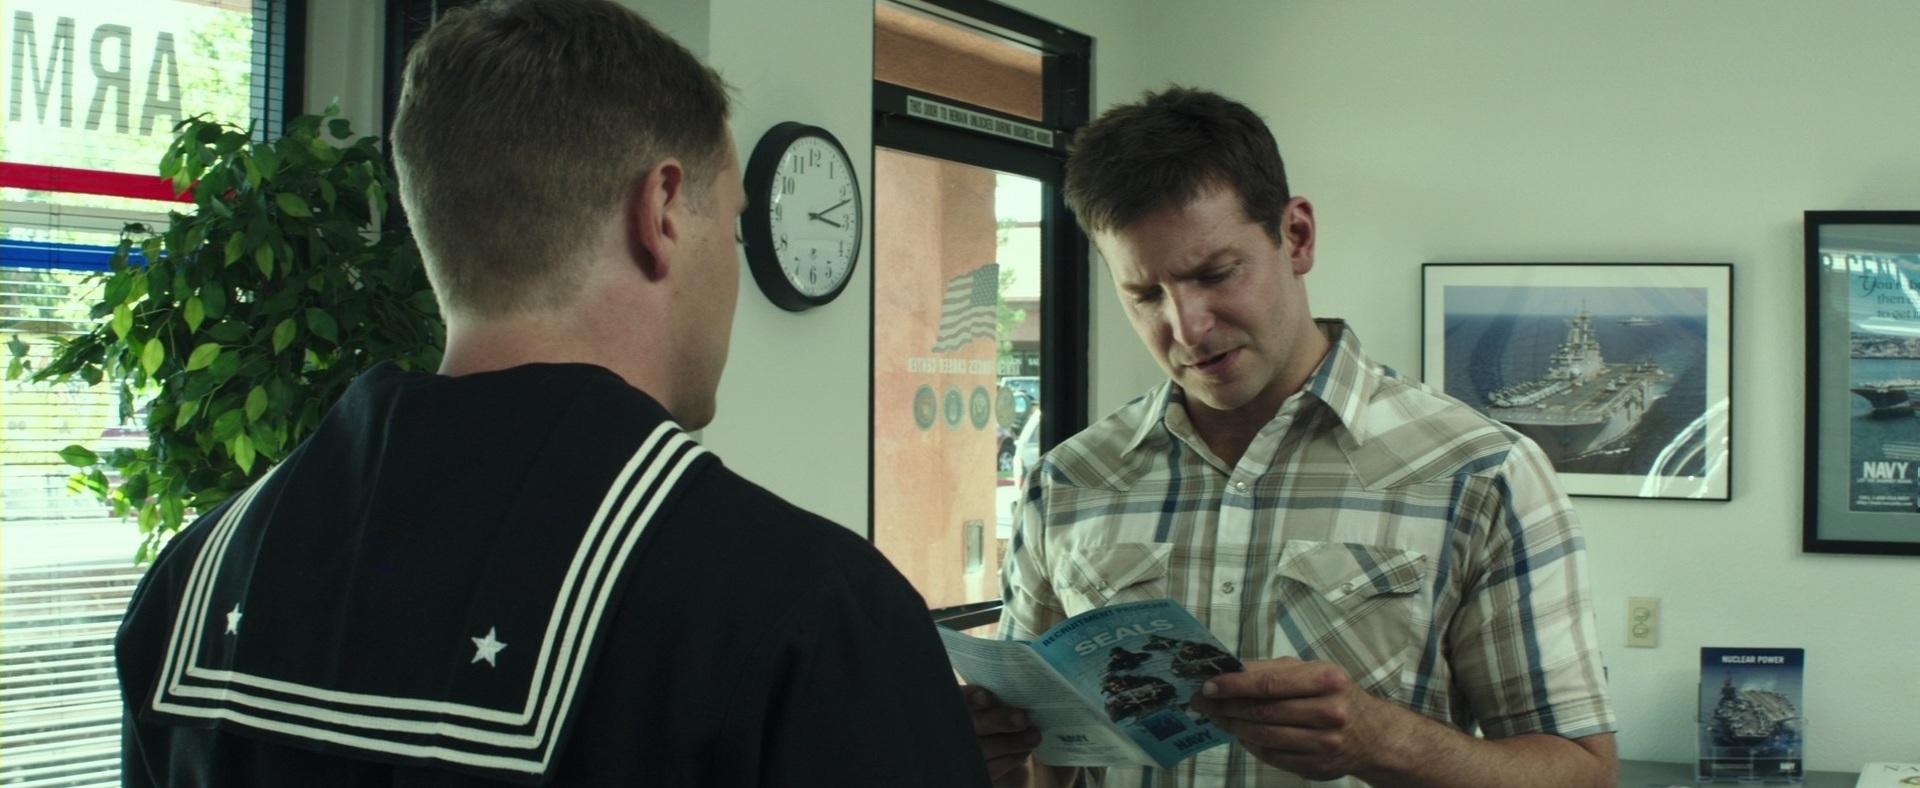 Five U S  Navy SEALS Recruitment Pamphlets | Prop Store